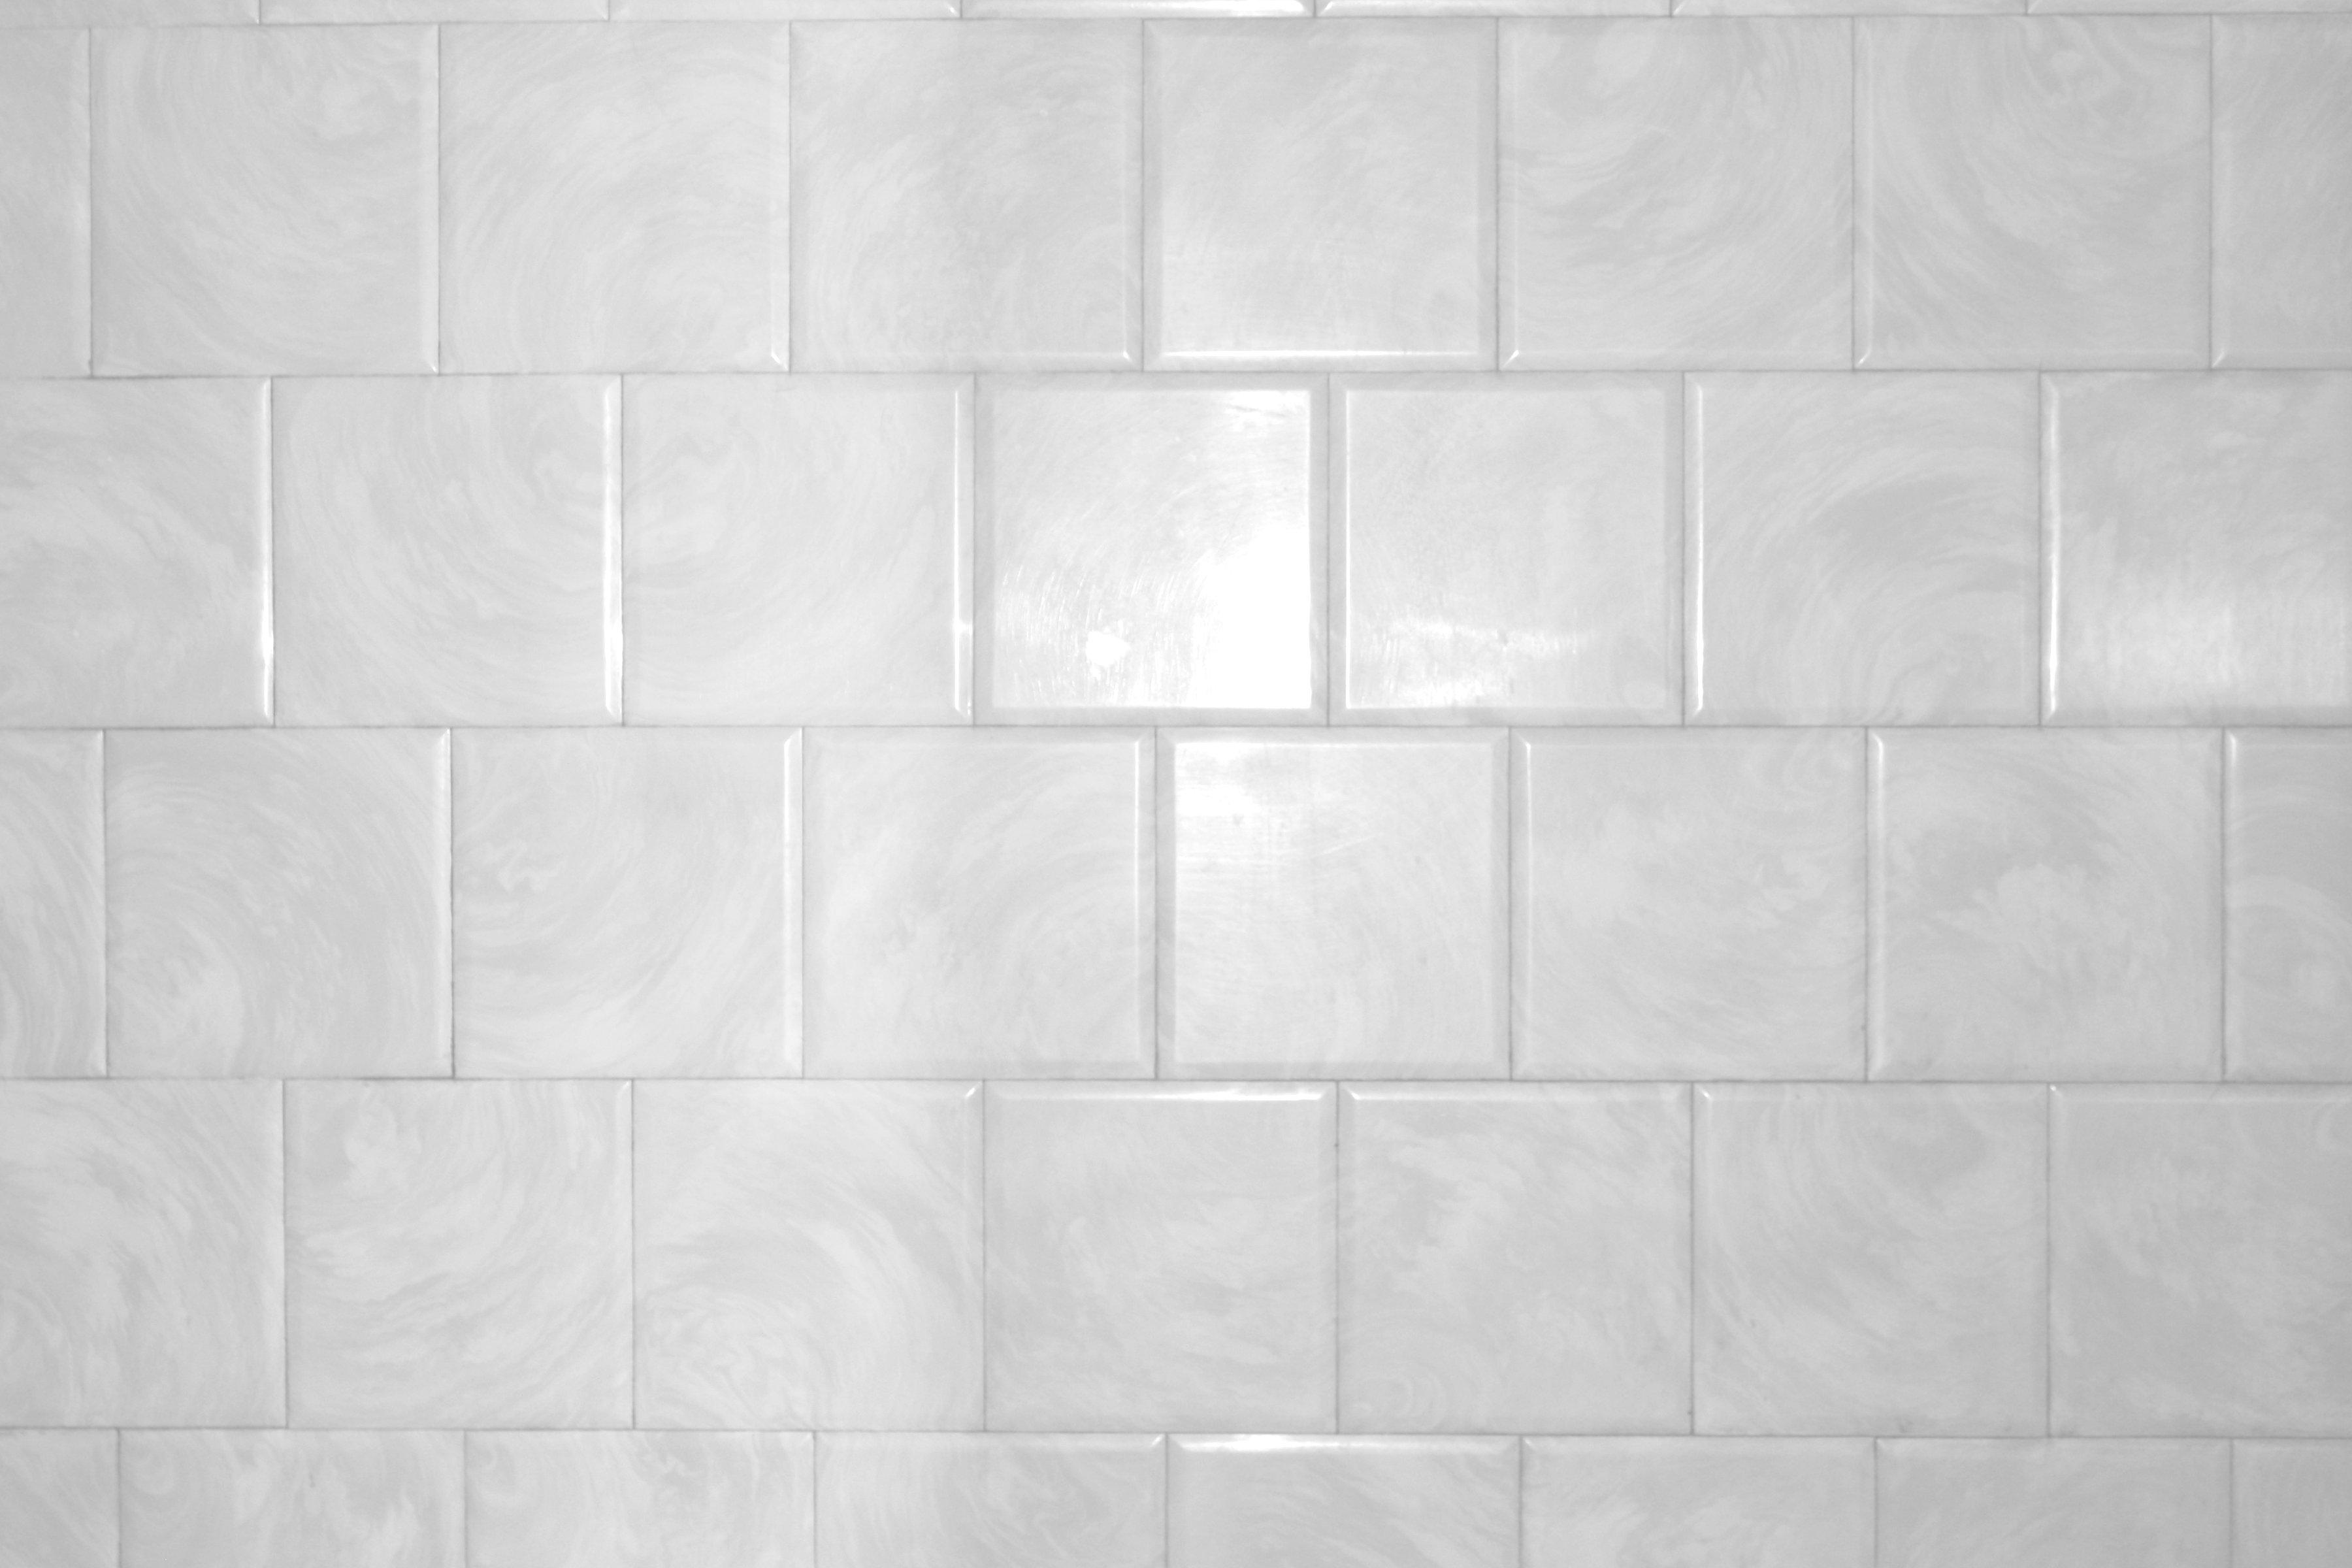 Unique Bathroom Floor Tile Ideas for Small Bathrooms Picture ...